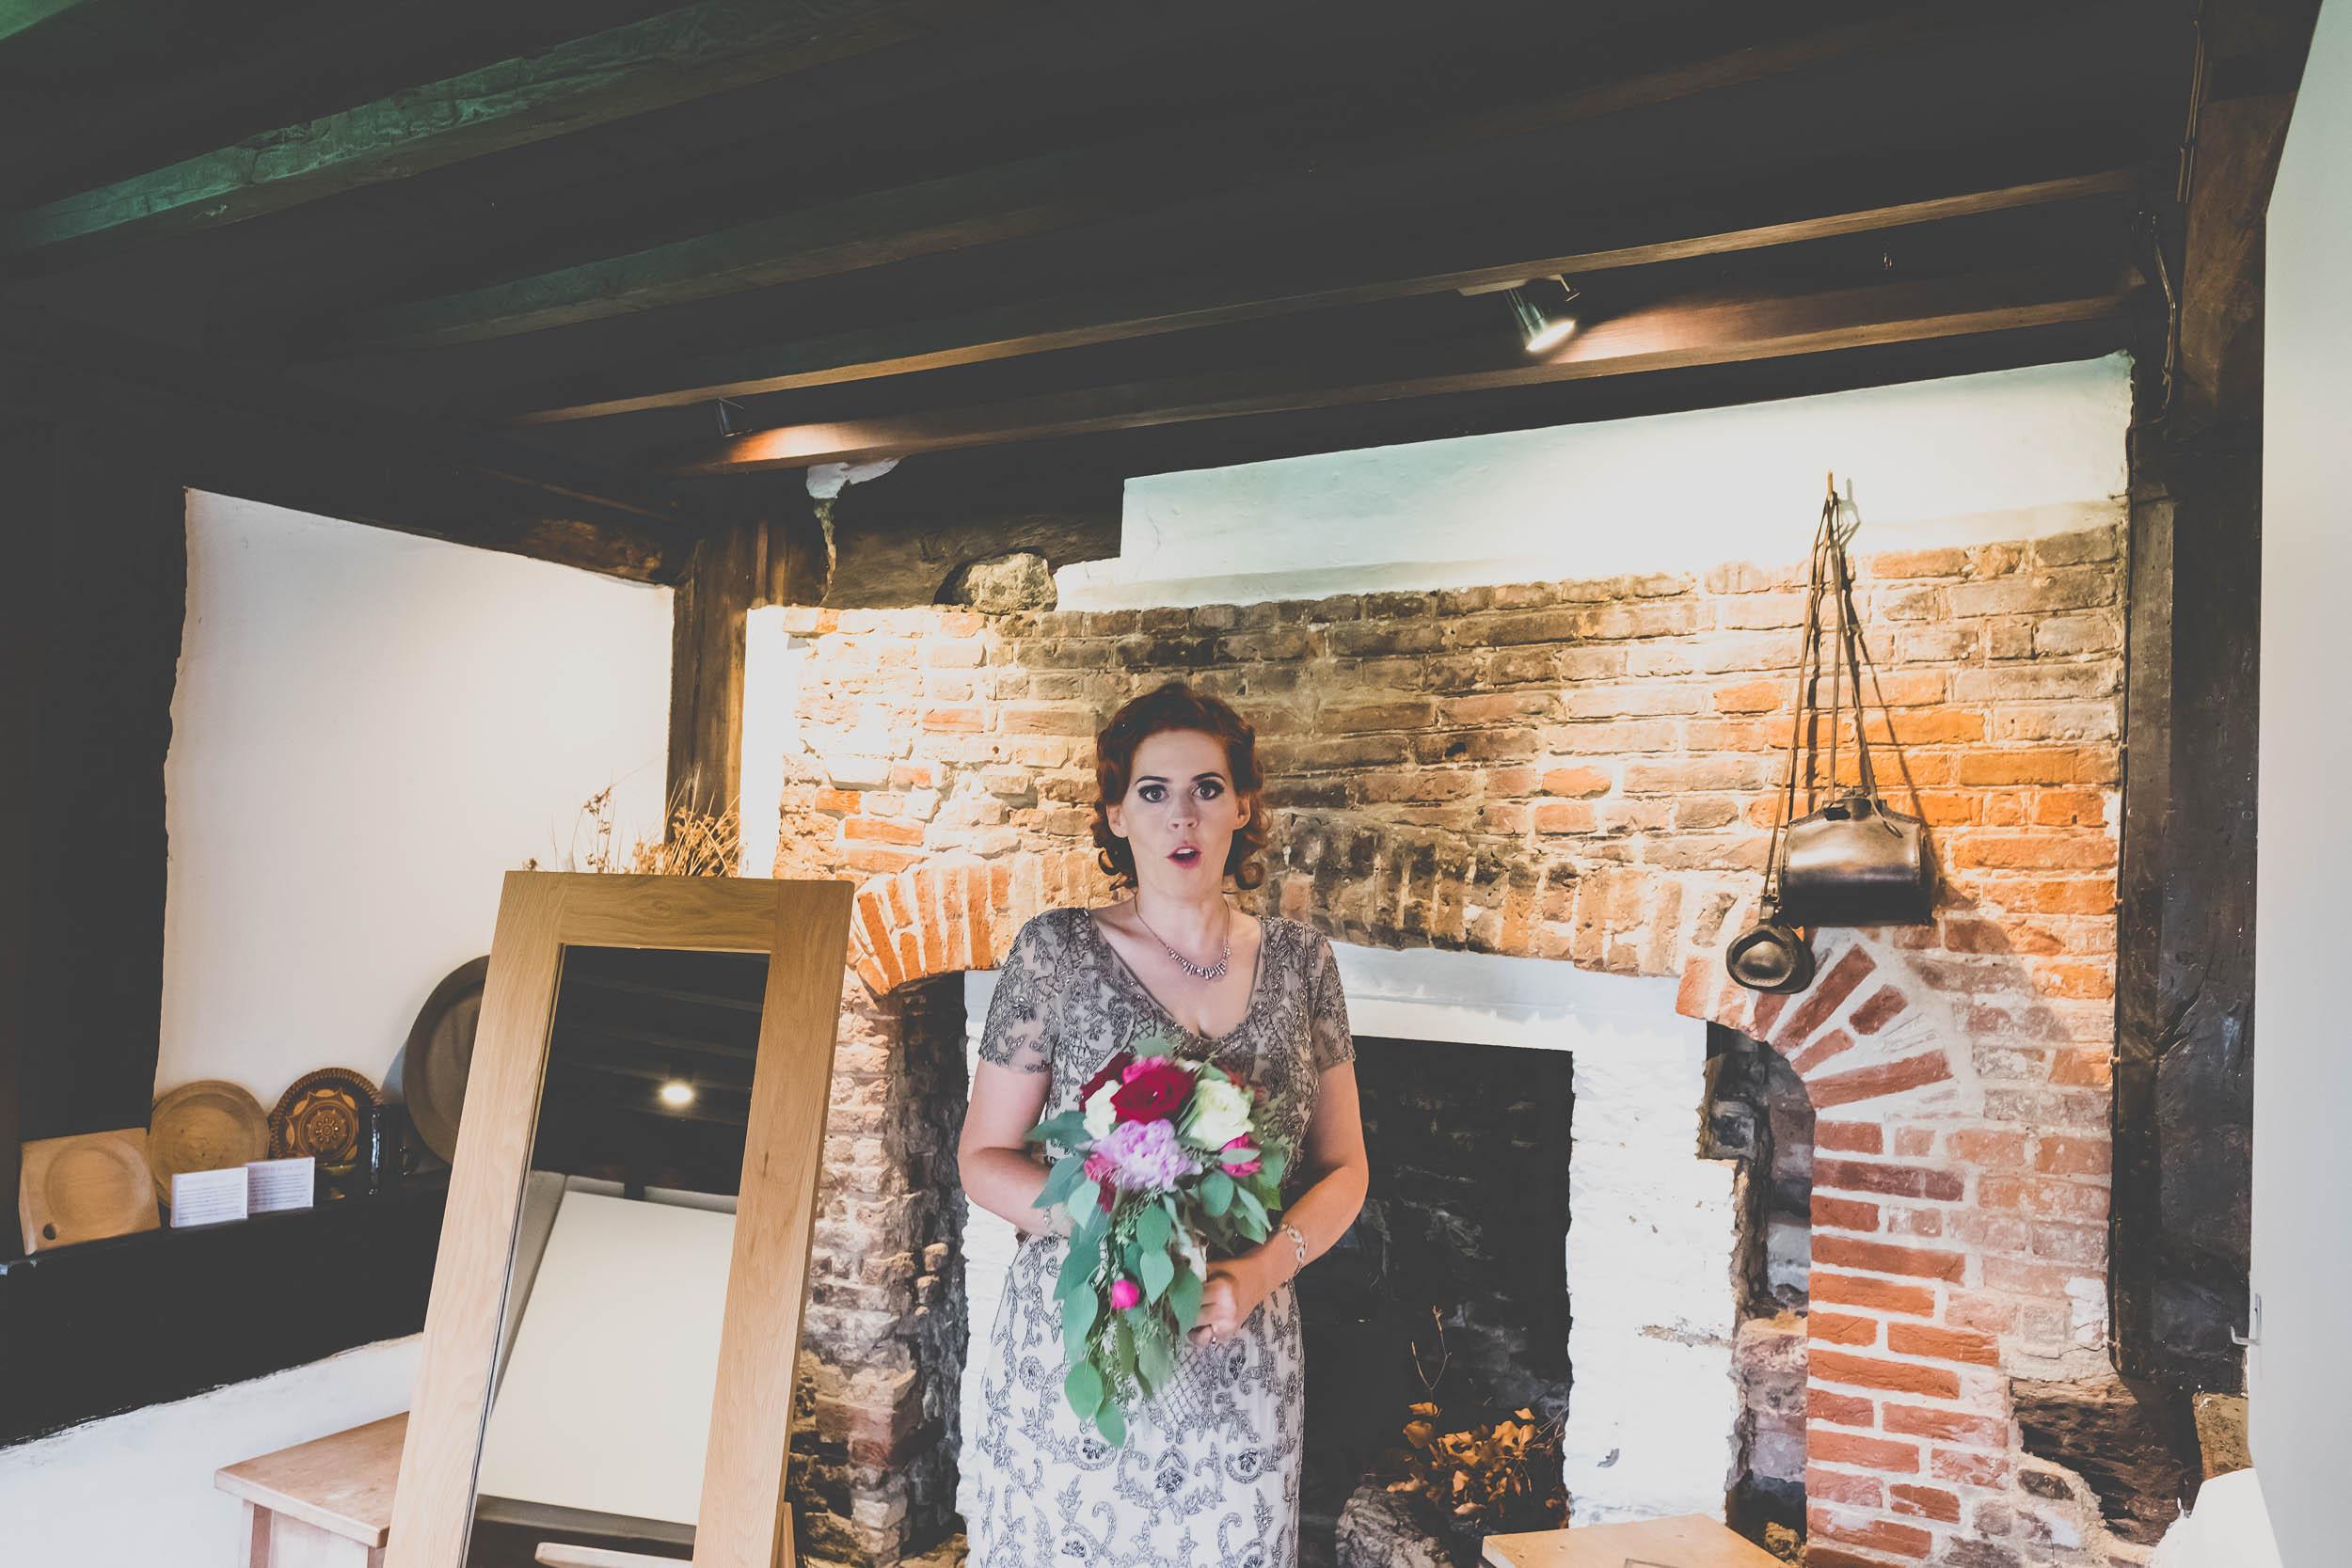 queen-elizabeths-hunting-lodge-epping-forest-wedding027.jpg